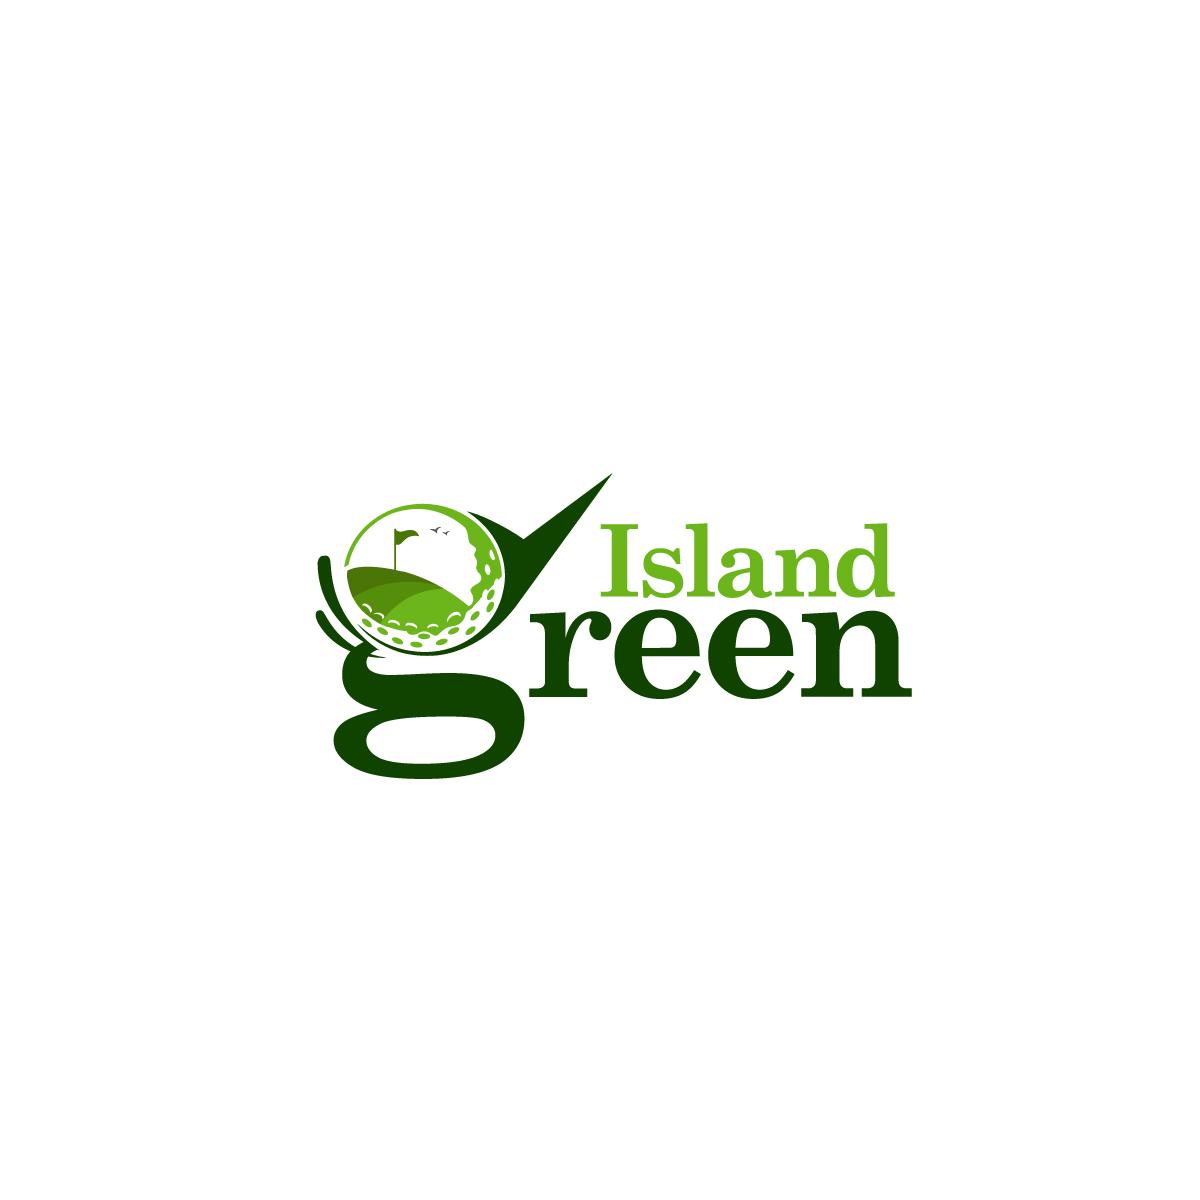 Modern Masculine Golf Course Logo Design For Island Green Golf Club Or Island Green Or Ig By Creative Bugs Design 17334913